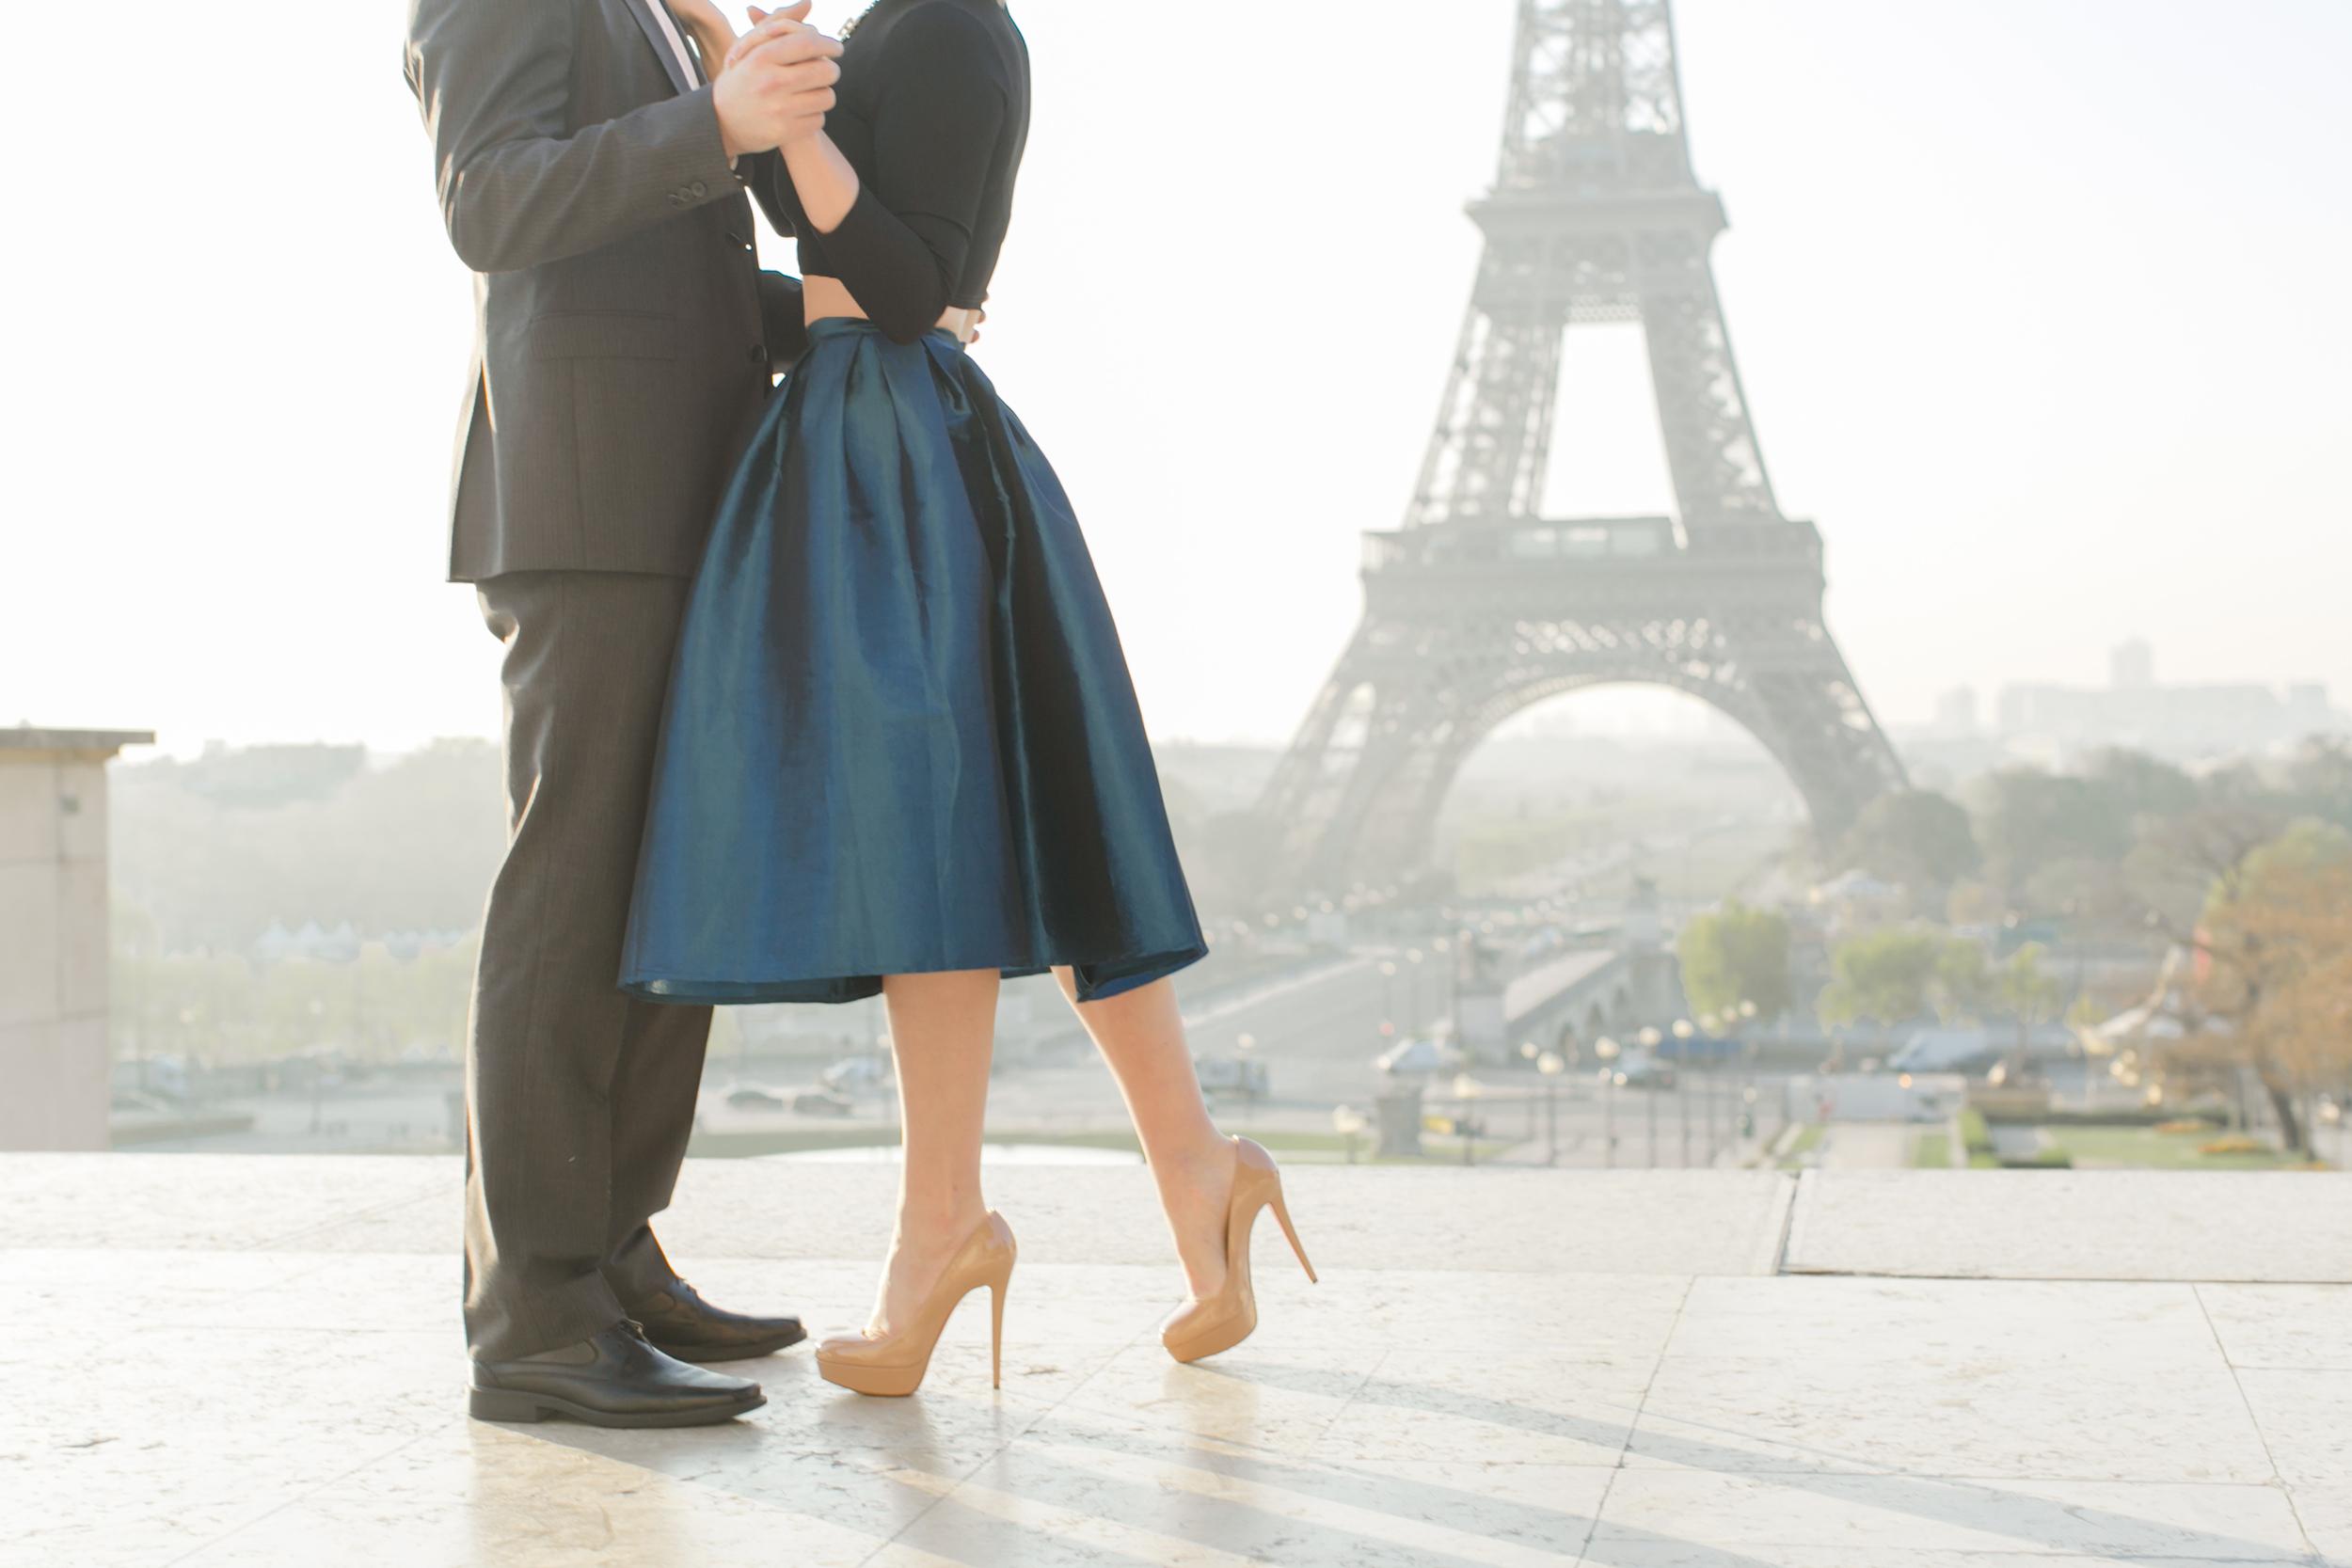 richelle-hunter-photography-paris-wedding-photographer-emily-tyrell-4 copy.jpg